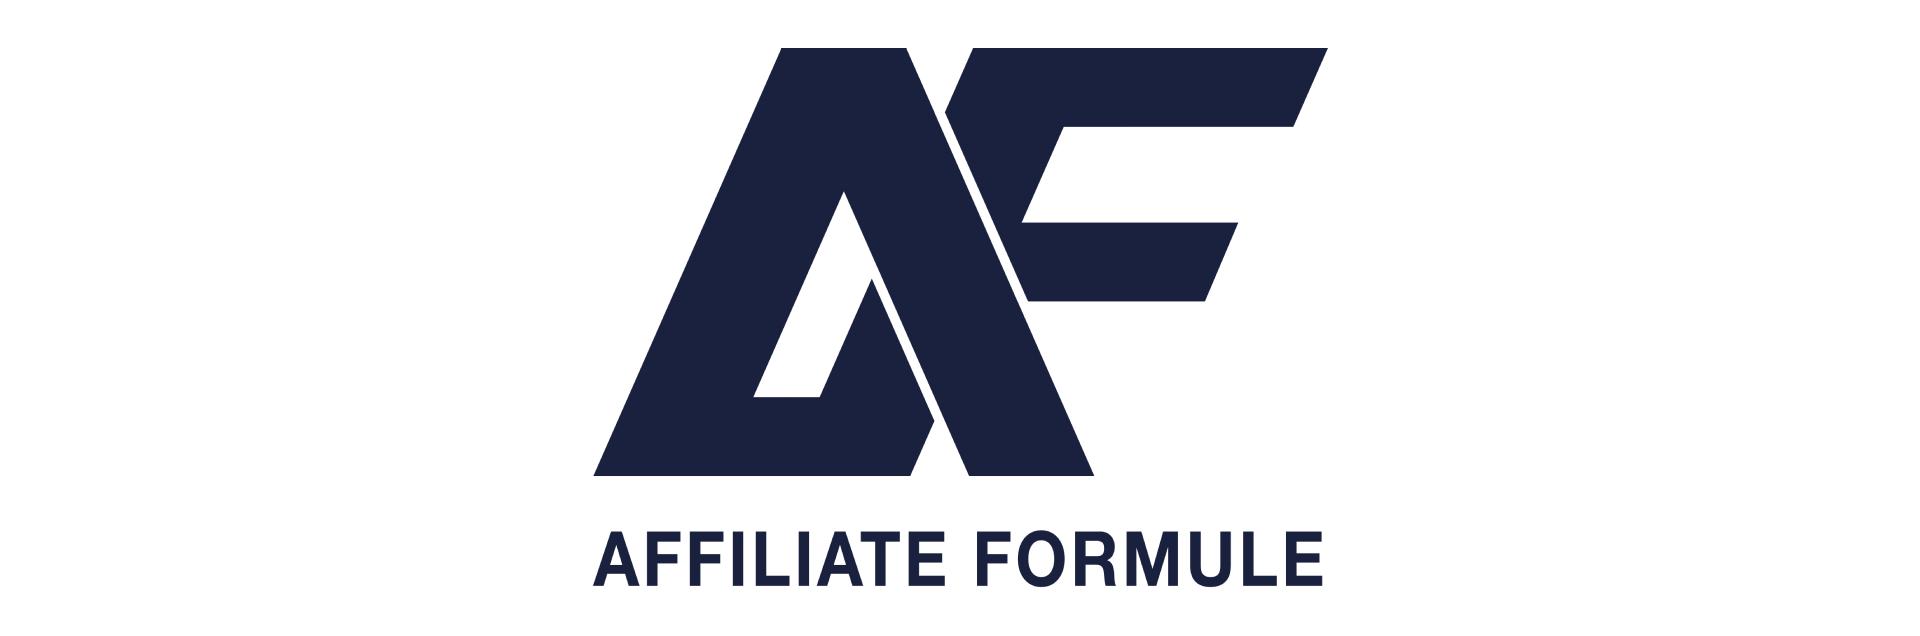 affiliate formule review